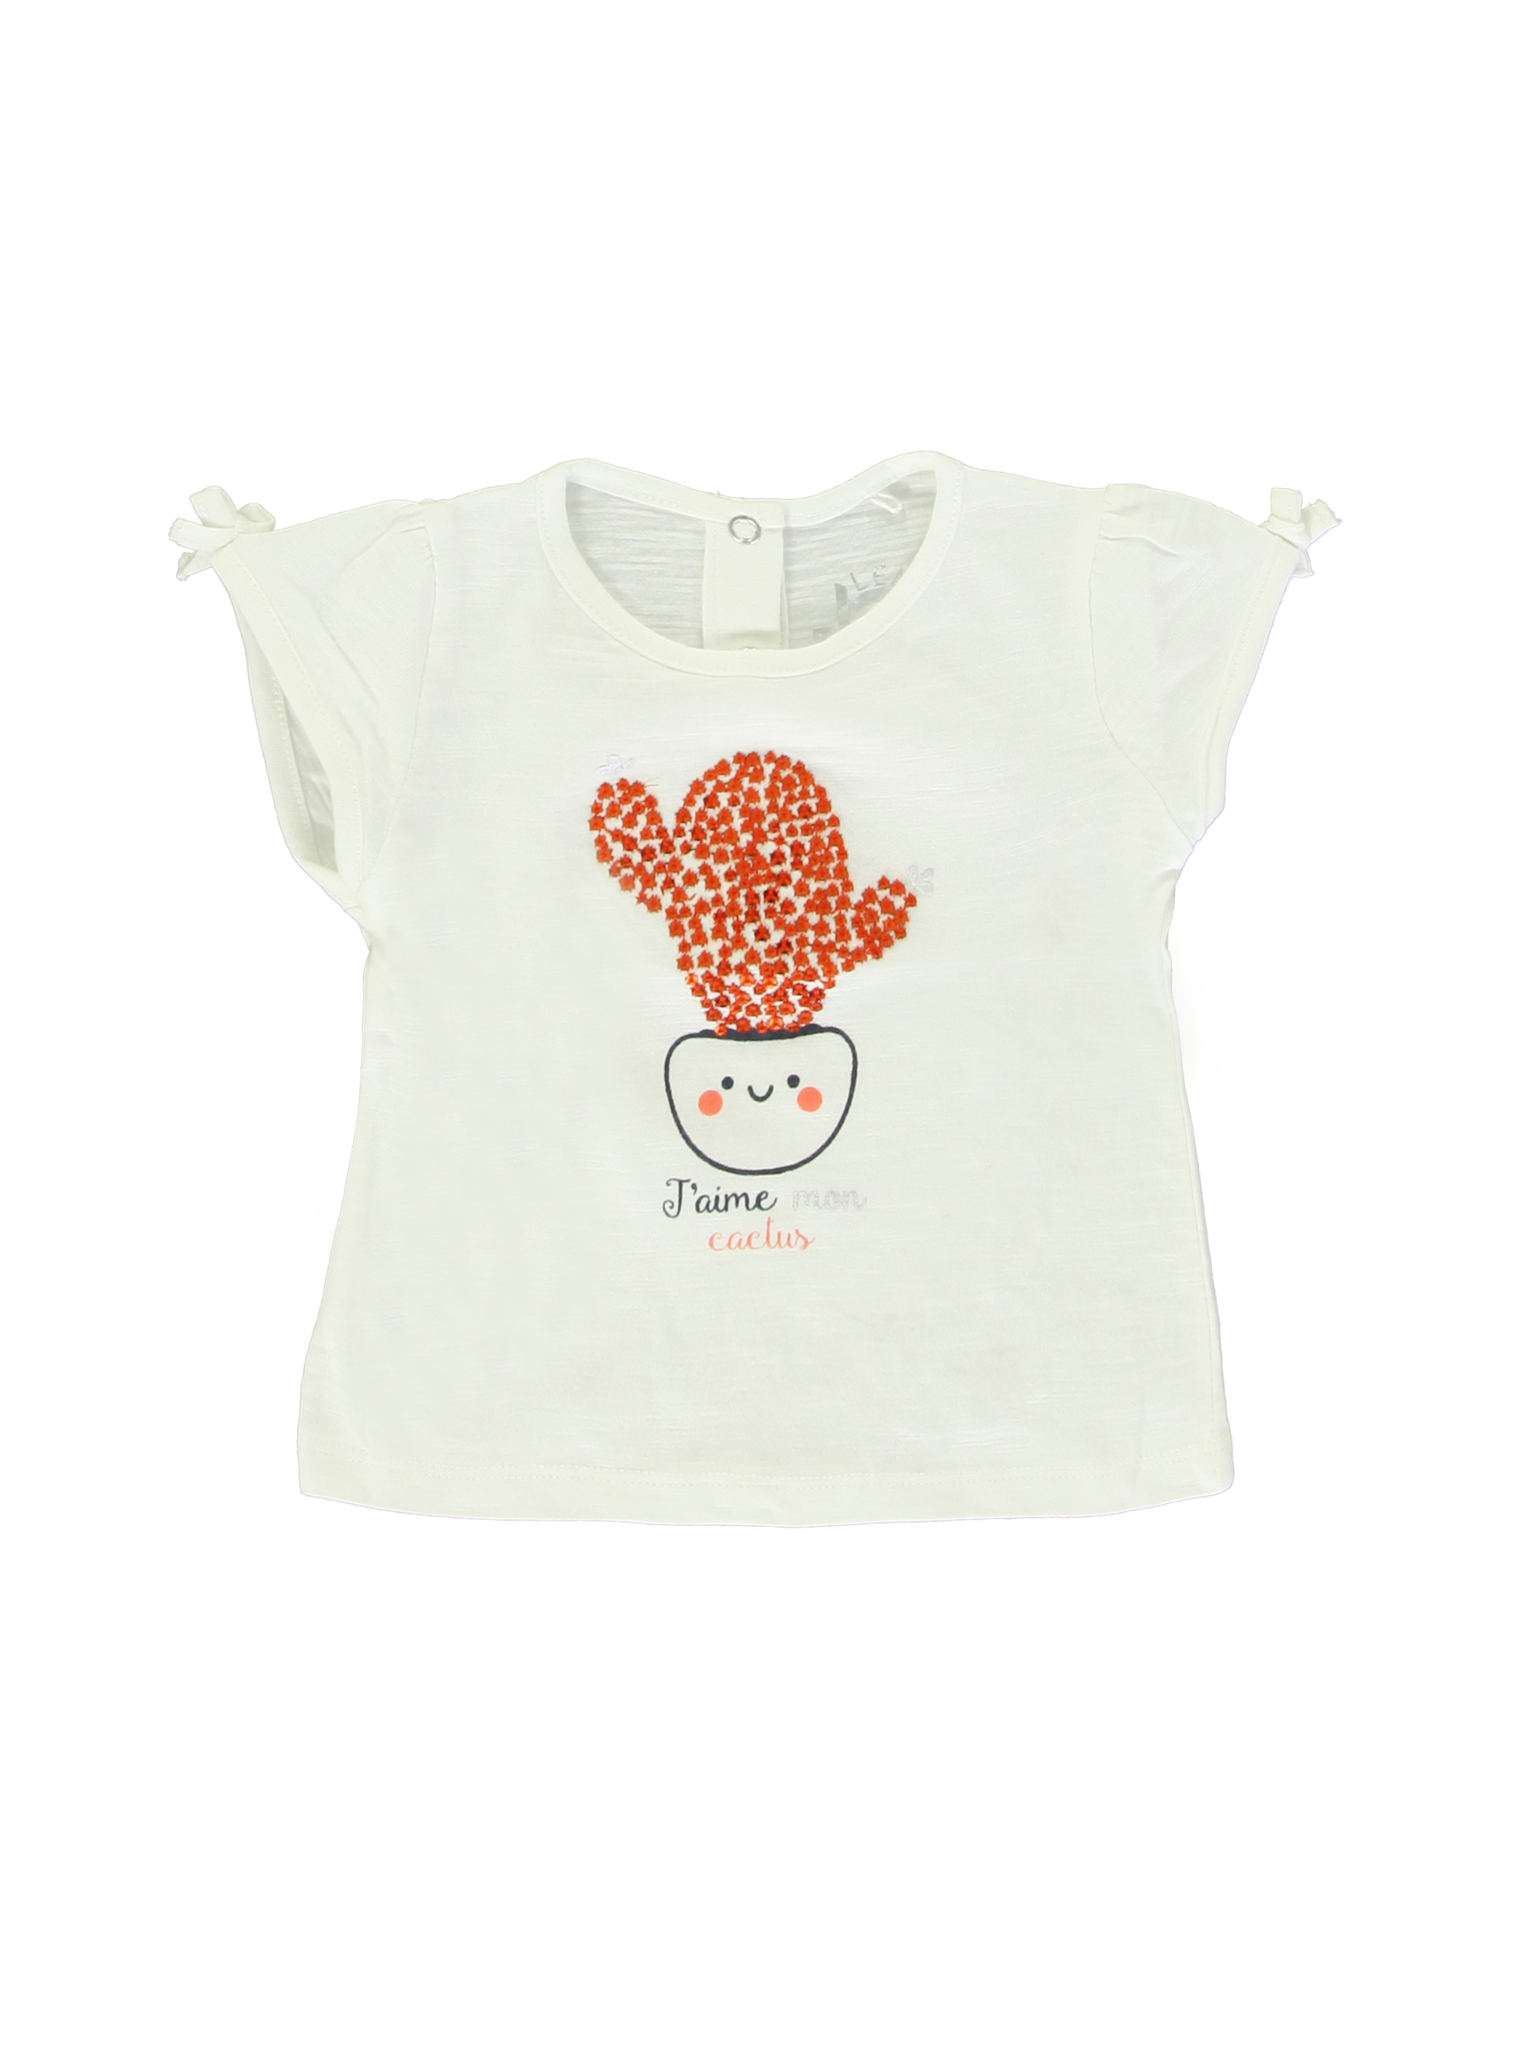 All Brands   Summerproducts Baby   T-shirt   8 pcs/box